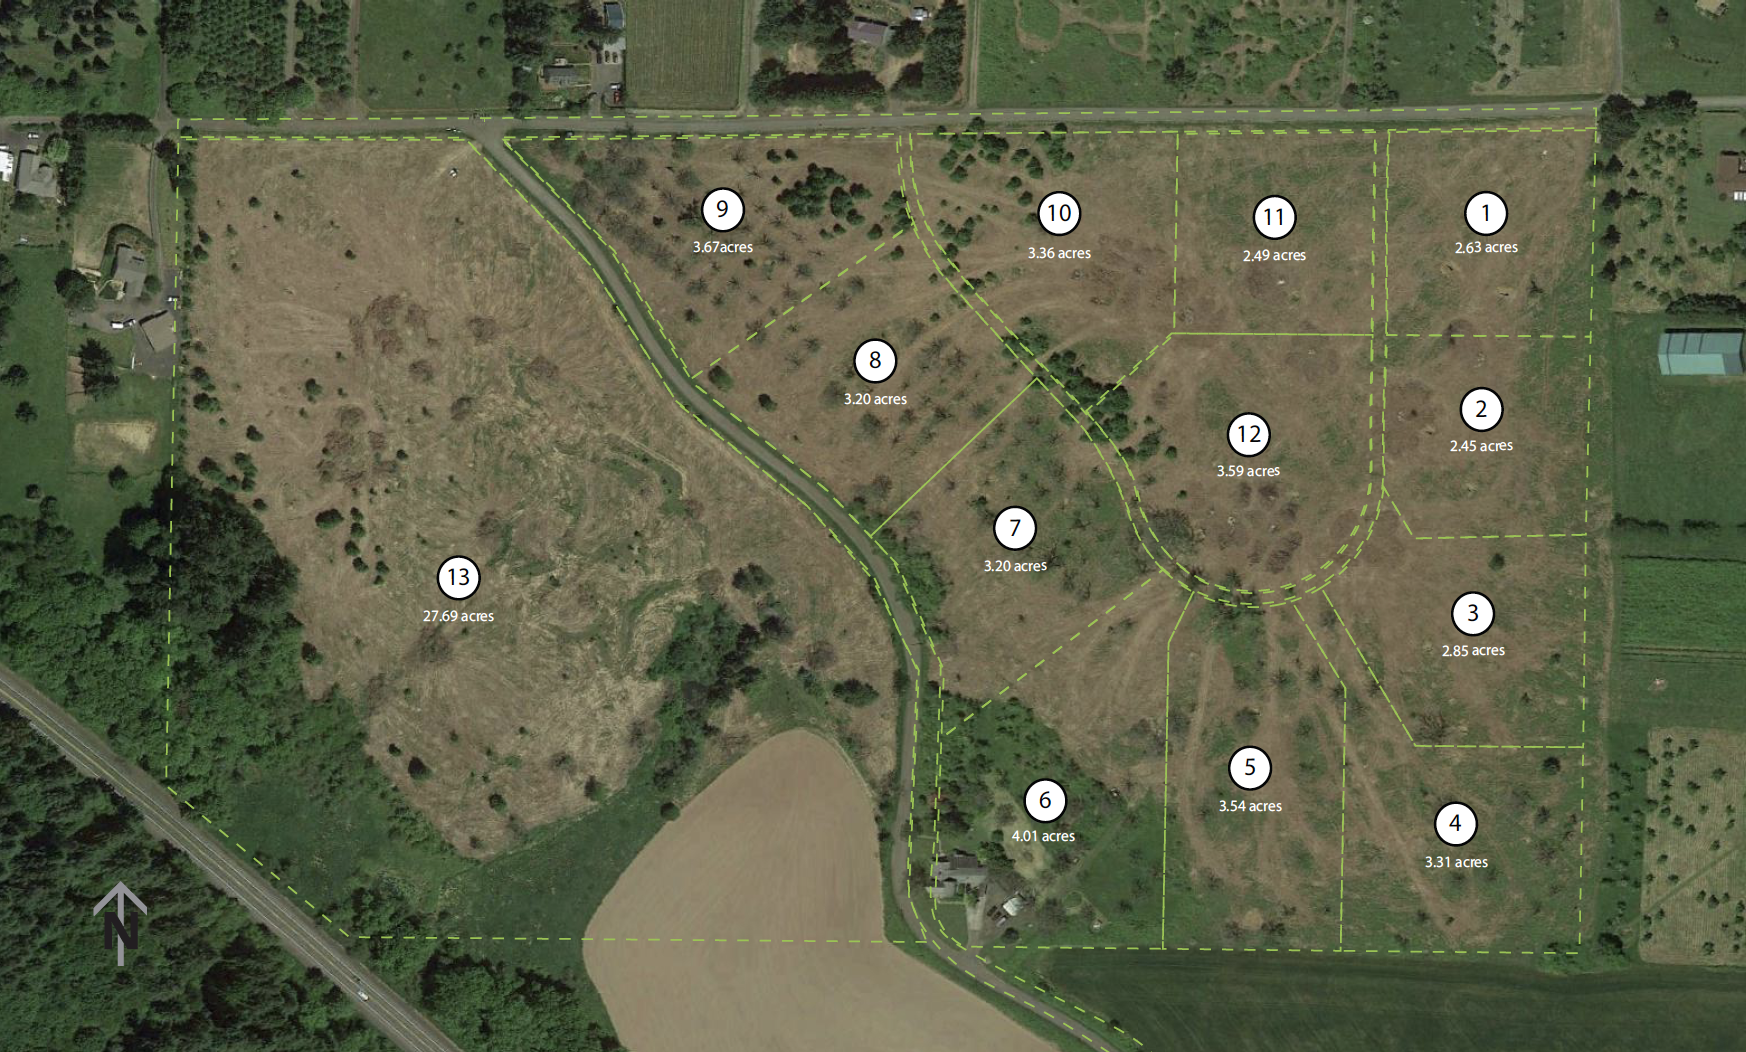 Maller-aerial-map